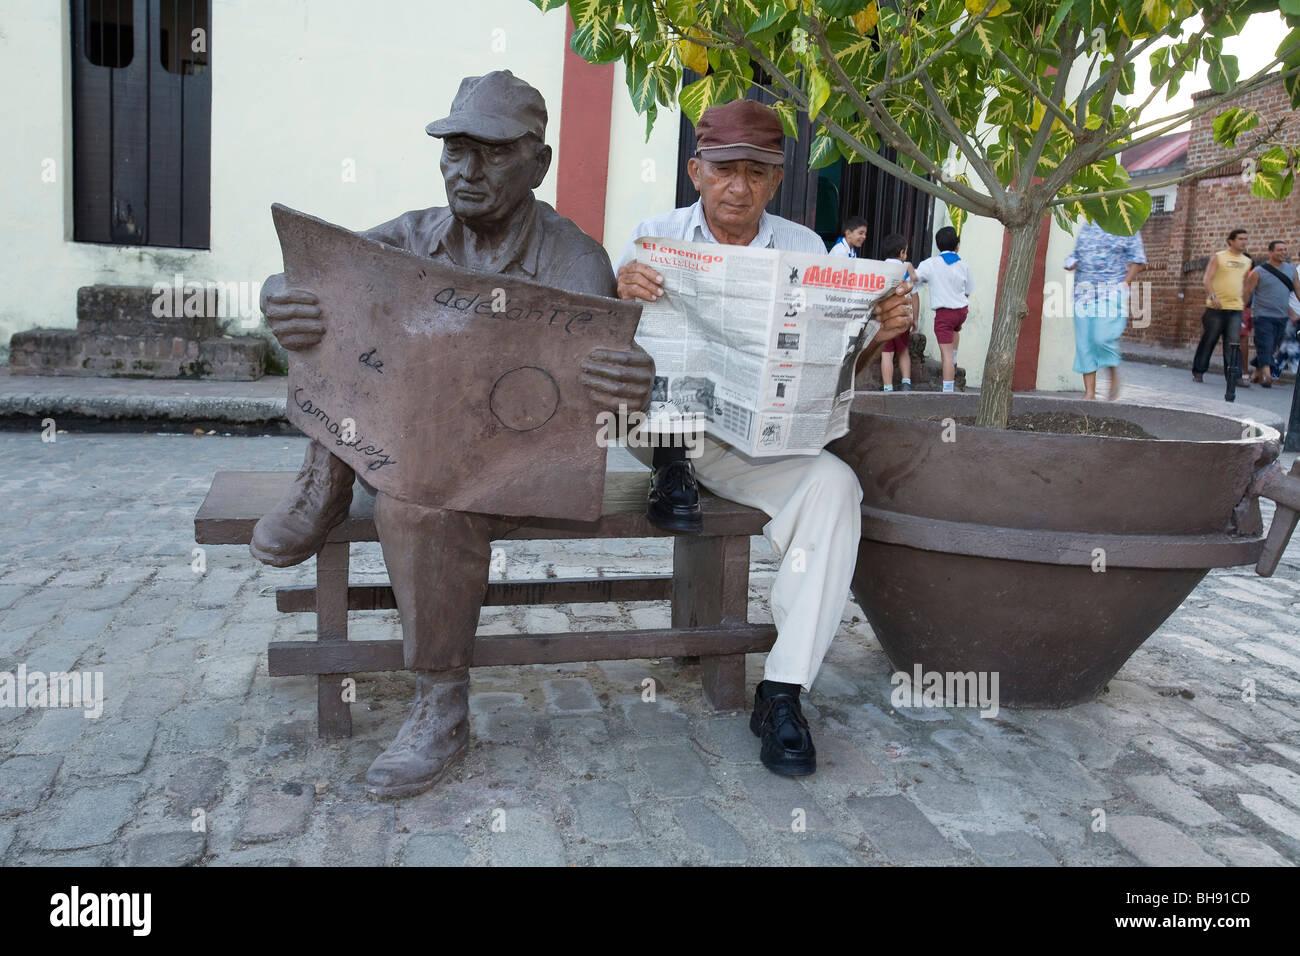 Straßenszene am Plaza del Carmen, Camagueey, Karibisches Meer, Kuba Stockbild